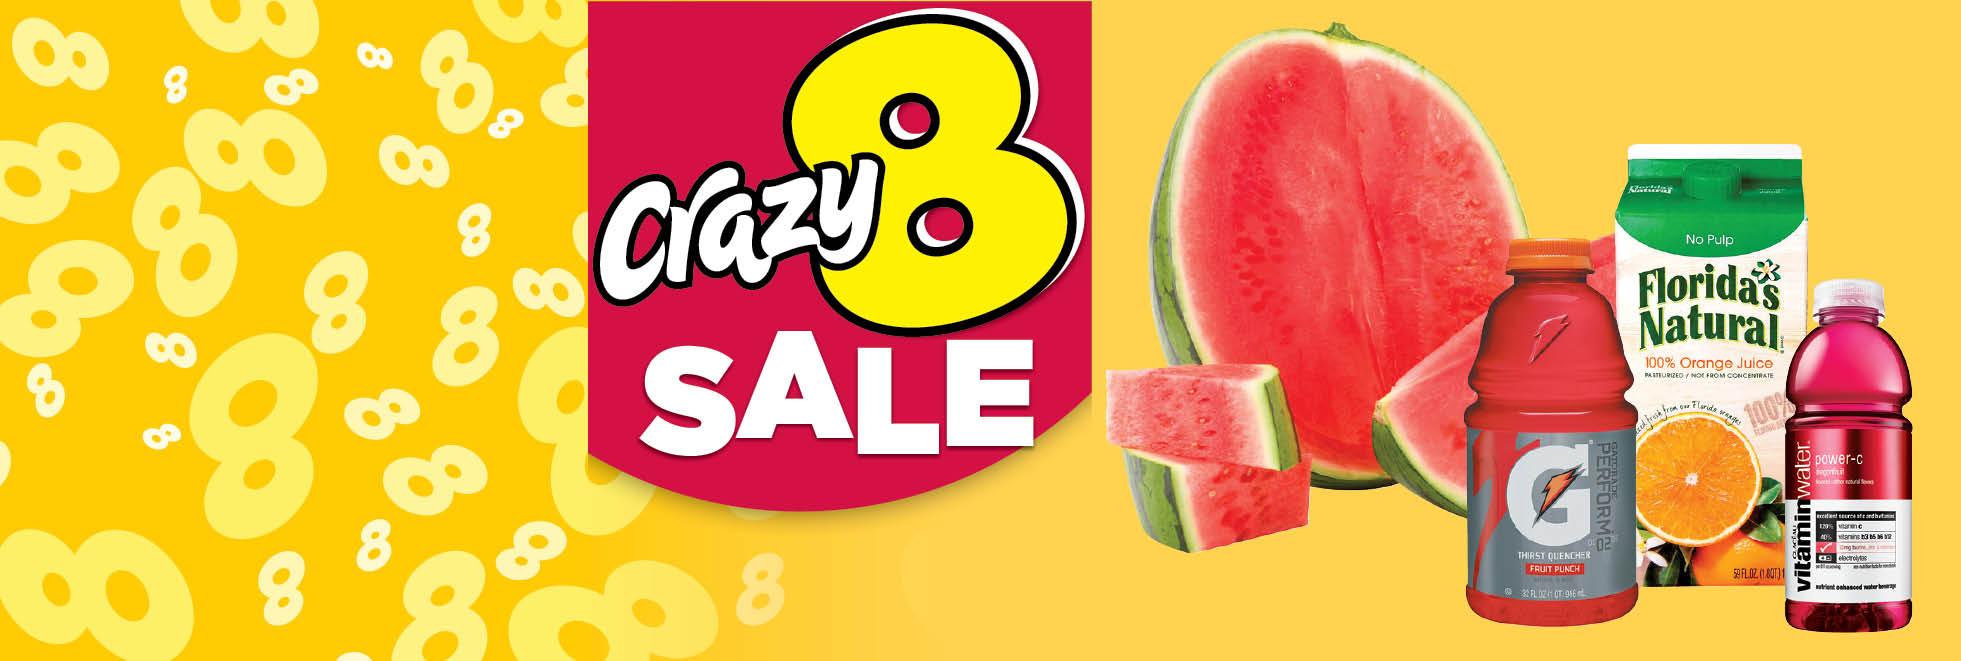 Crazy 8's Sale